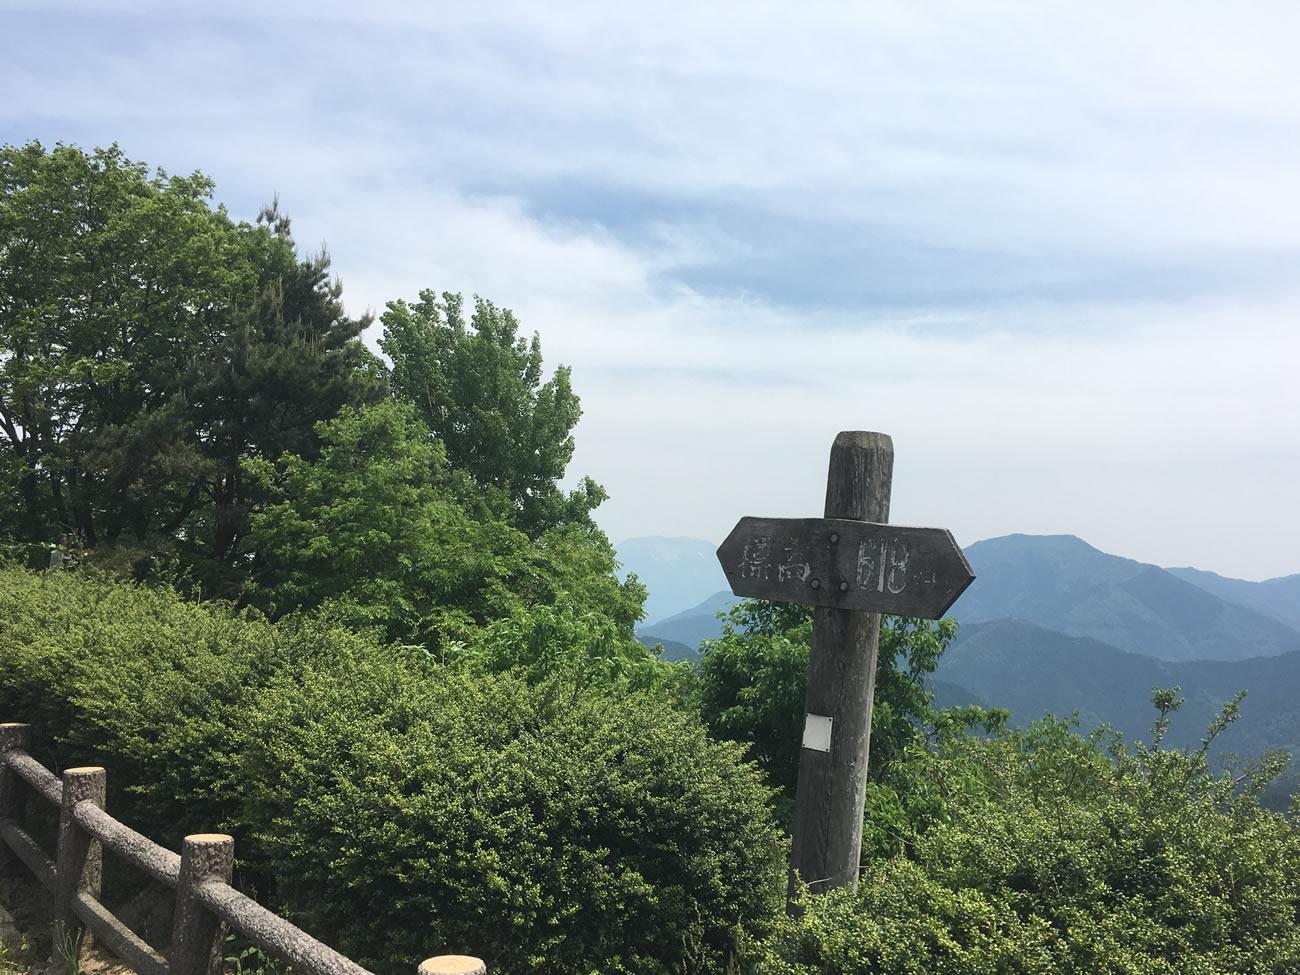 鳥取県の日野町の絶景